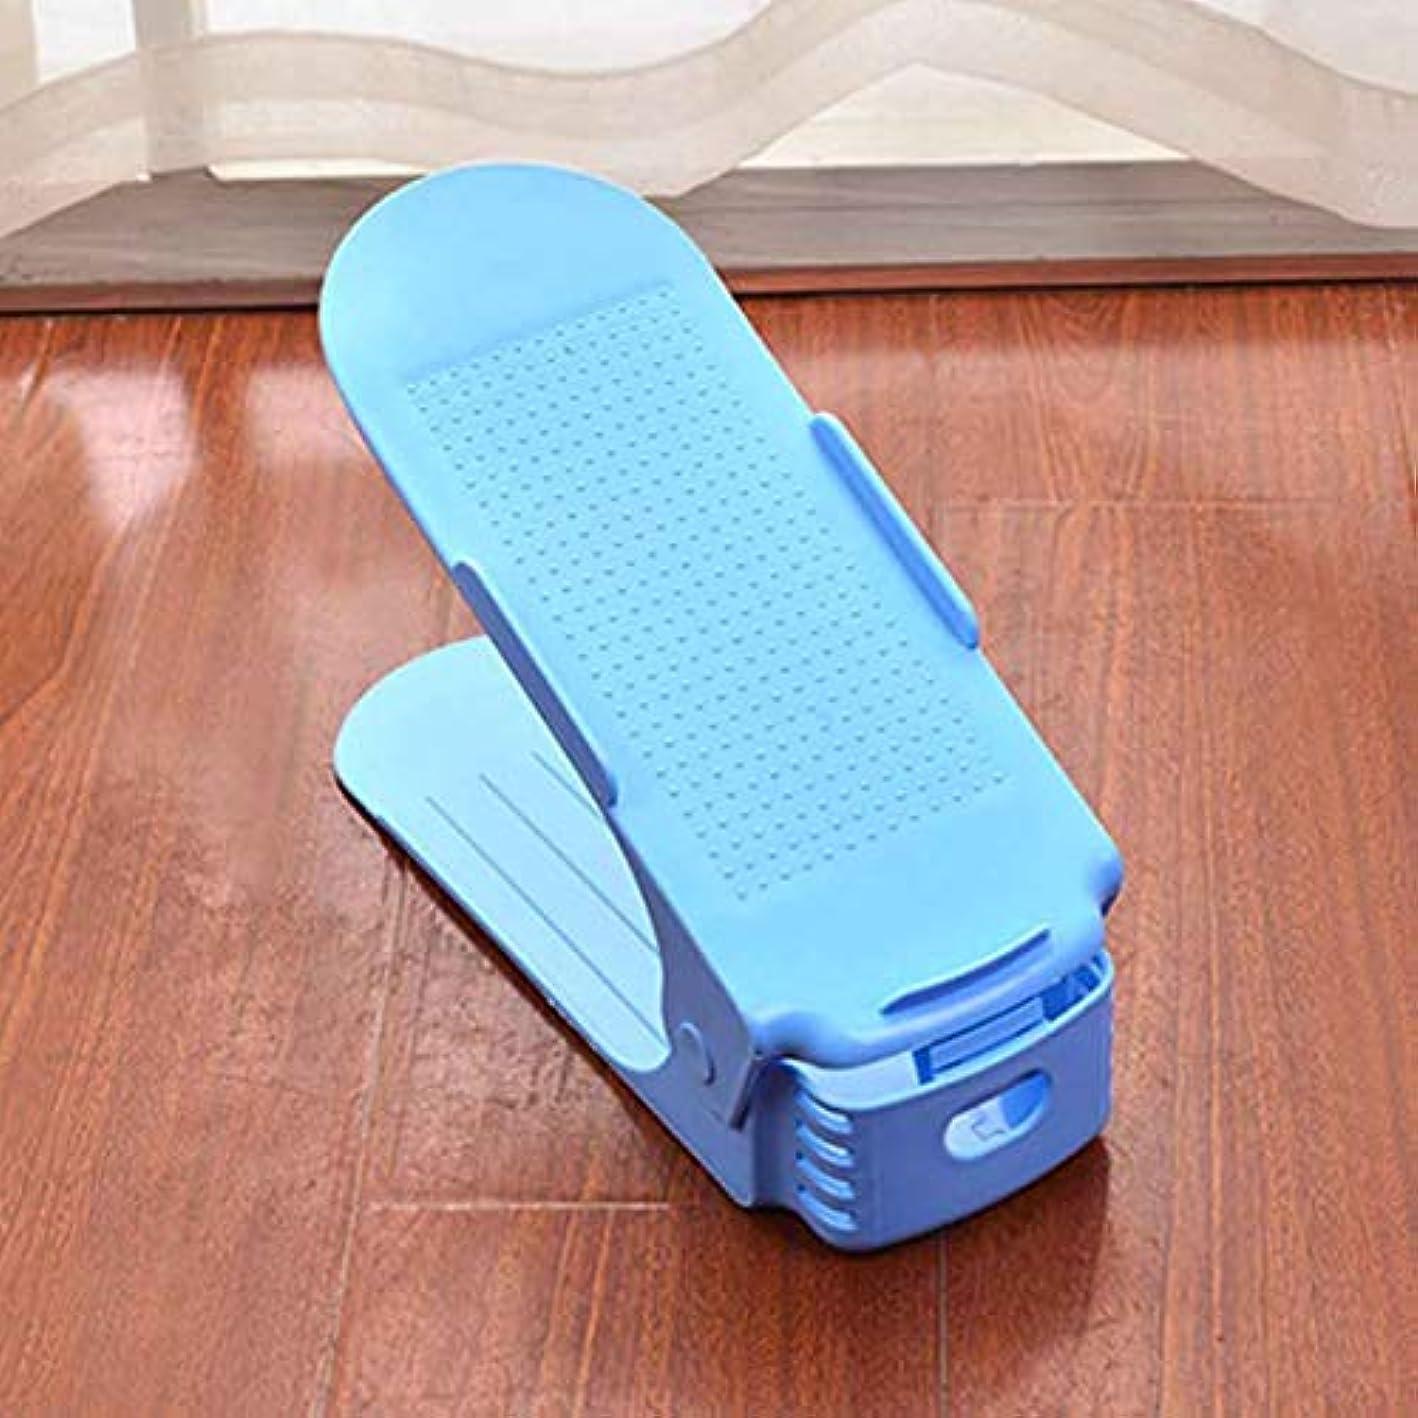 SHILEI Professional Home Use Shoe Organizer Modern Double Cleaning Storage Shoe Rack Living Room Convenient Shoebox Shoes Stand Shelf lo121531 Blue Color